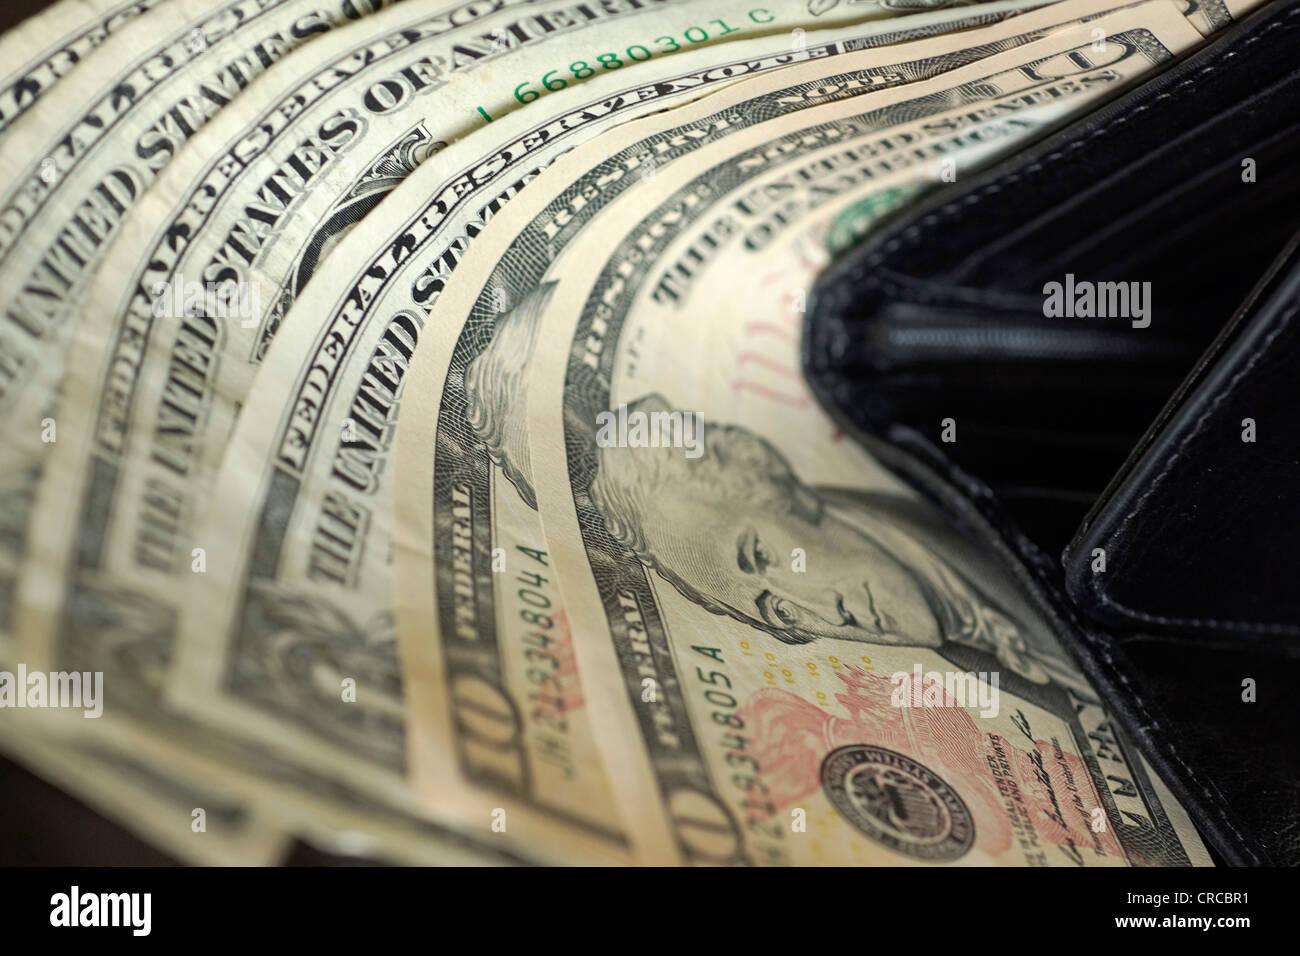 Dollar Bills, Notes, Monnaie US Dollars Photo Stock